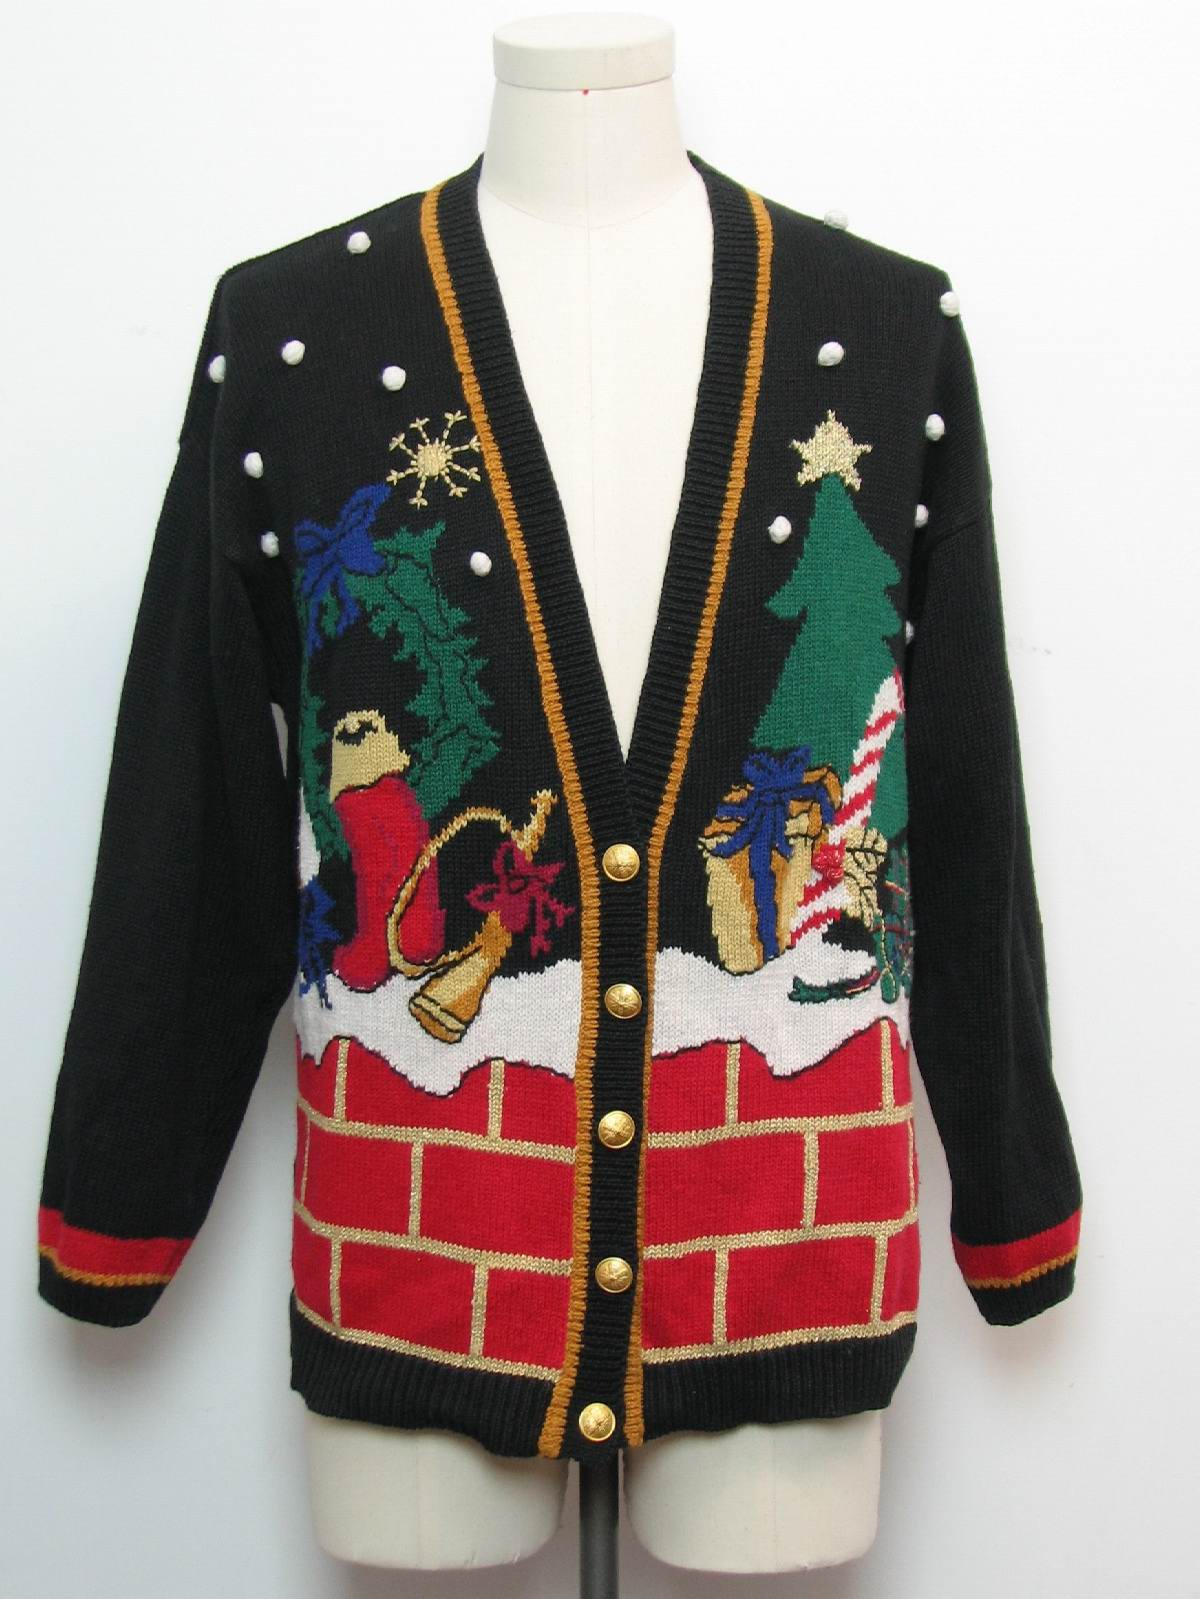 Ugly Christmas Cardigan Sweater: -Norton McNaughton- Unisex black